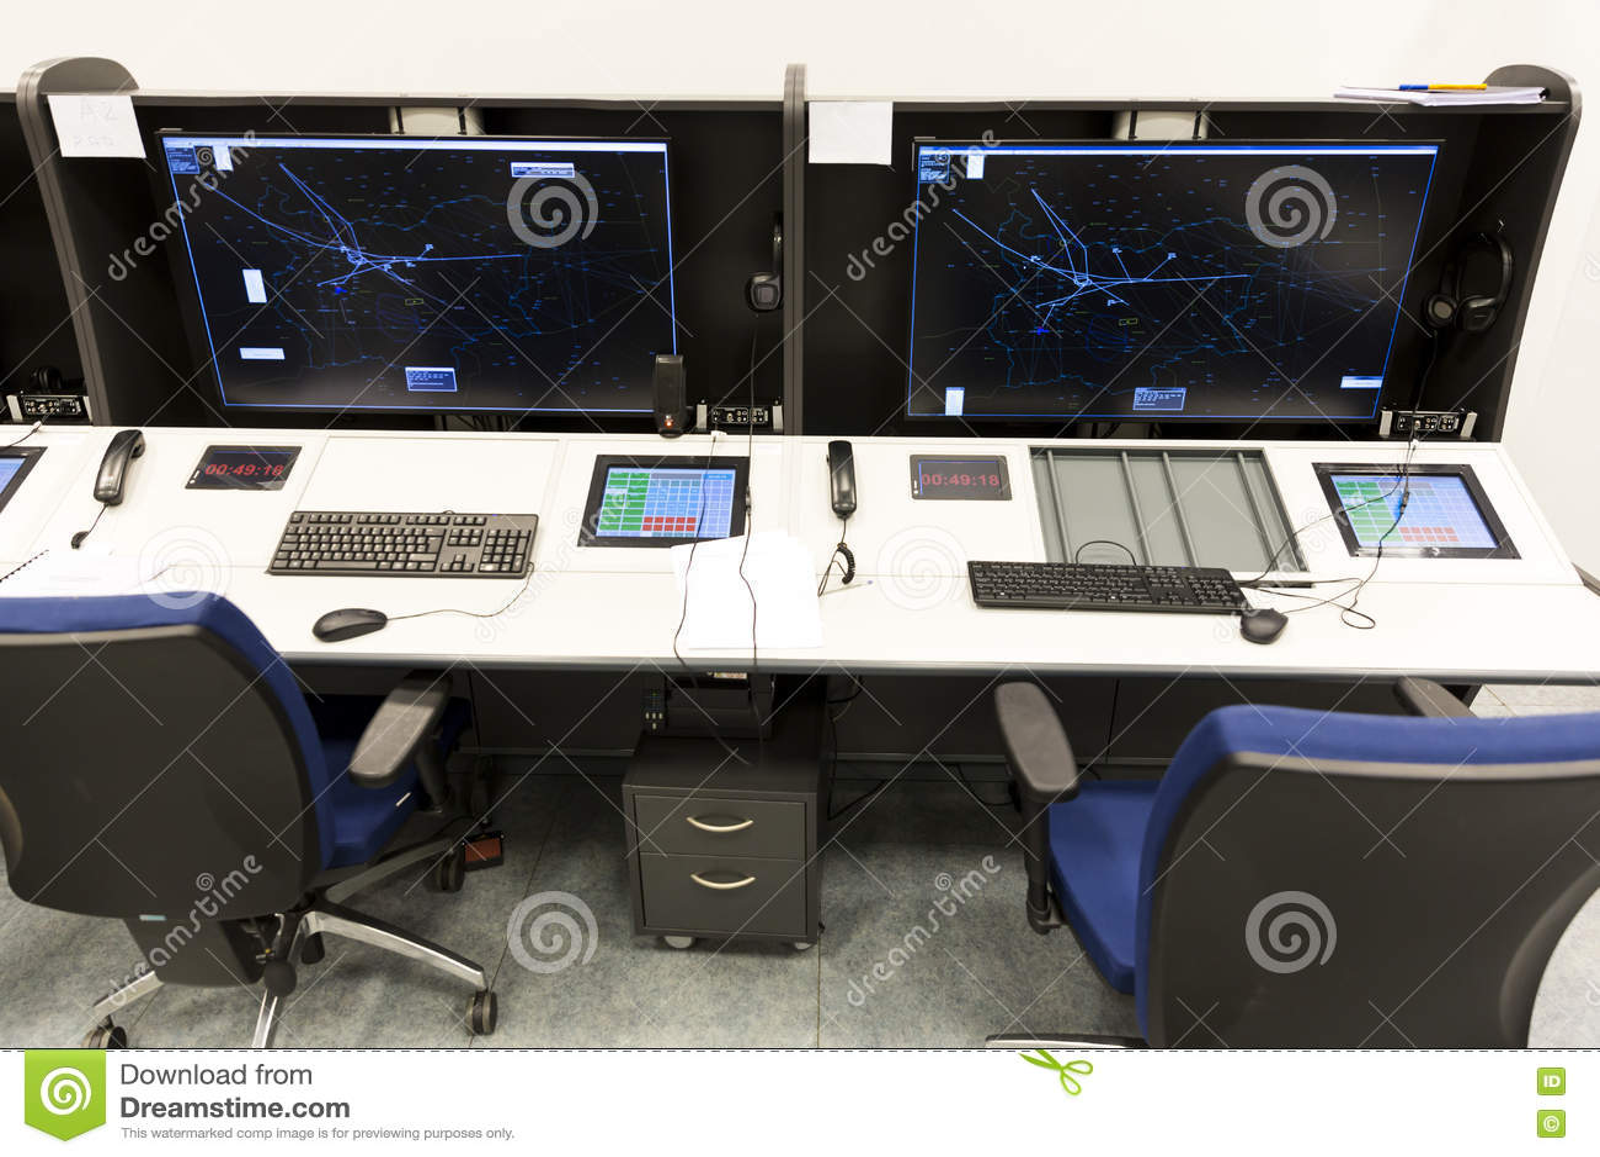 Controller& x27 da autoridade de serviços do tráfico aéreo; mesa de s